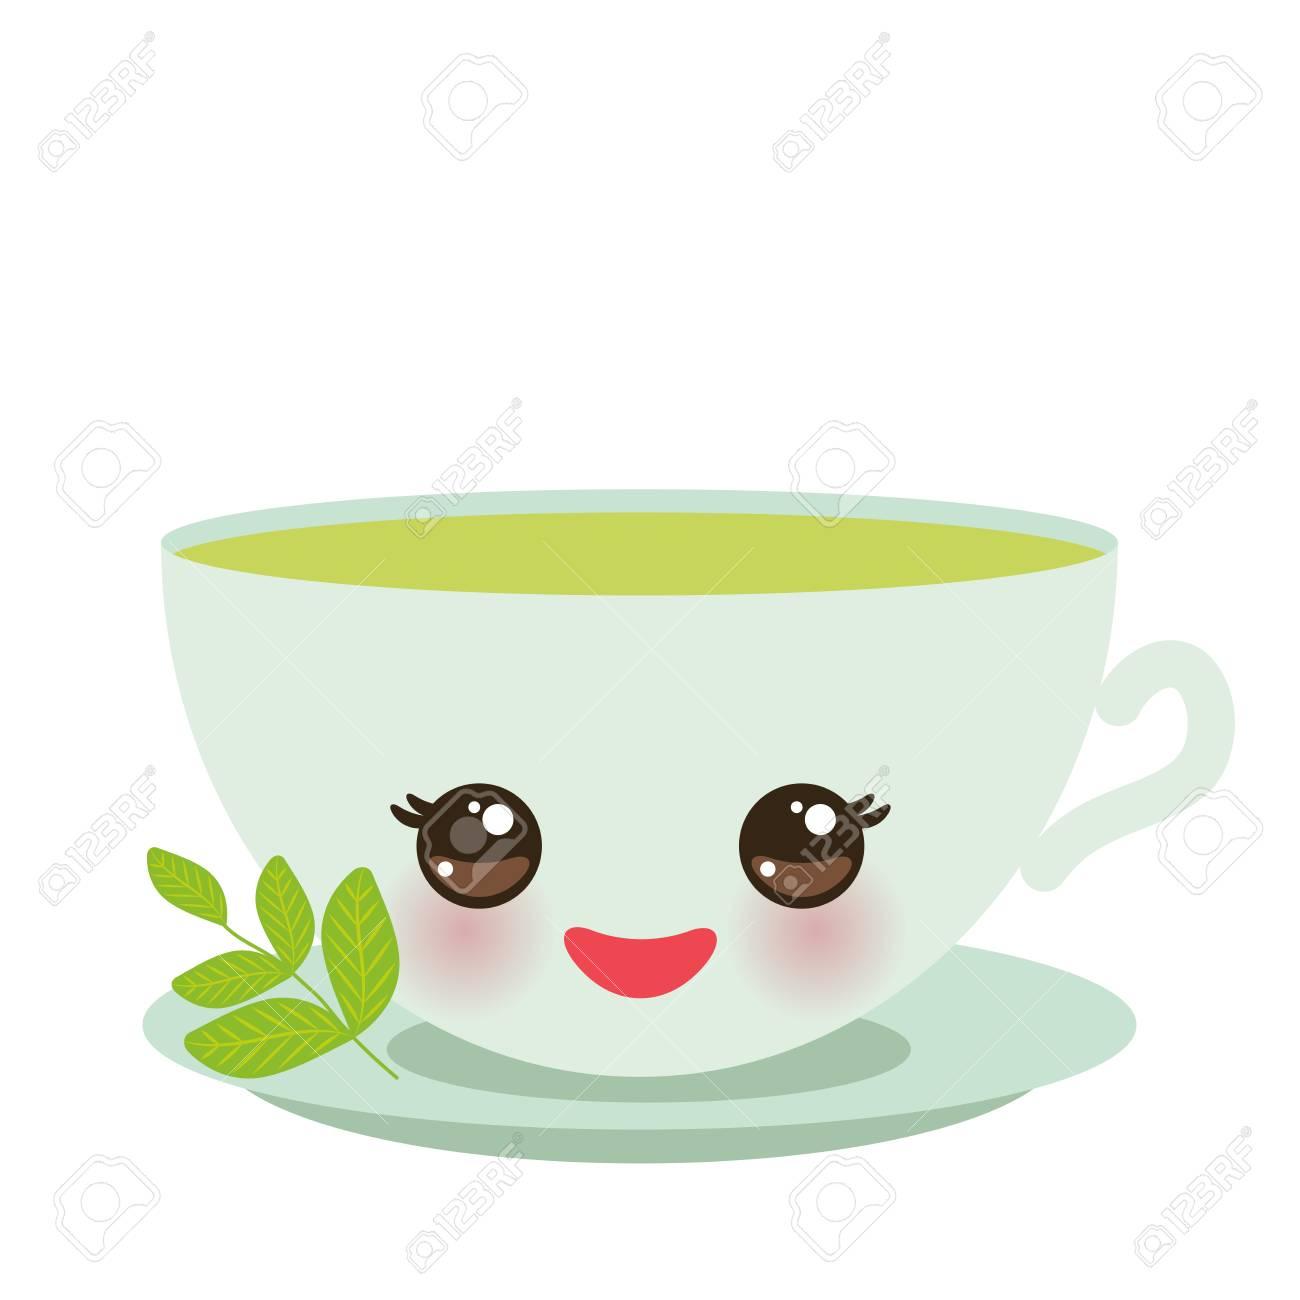 Vettoriale Tazza Verde Carina Kawaii Con Guance E Occhi Rosa Tè